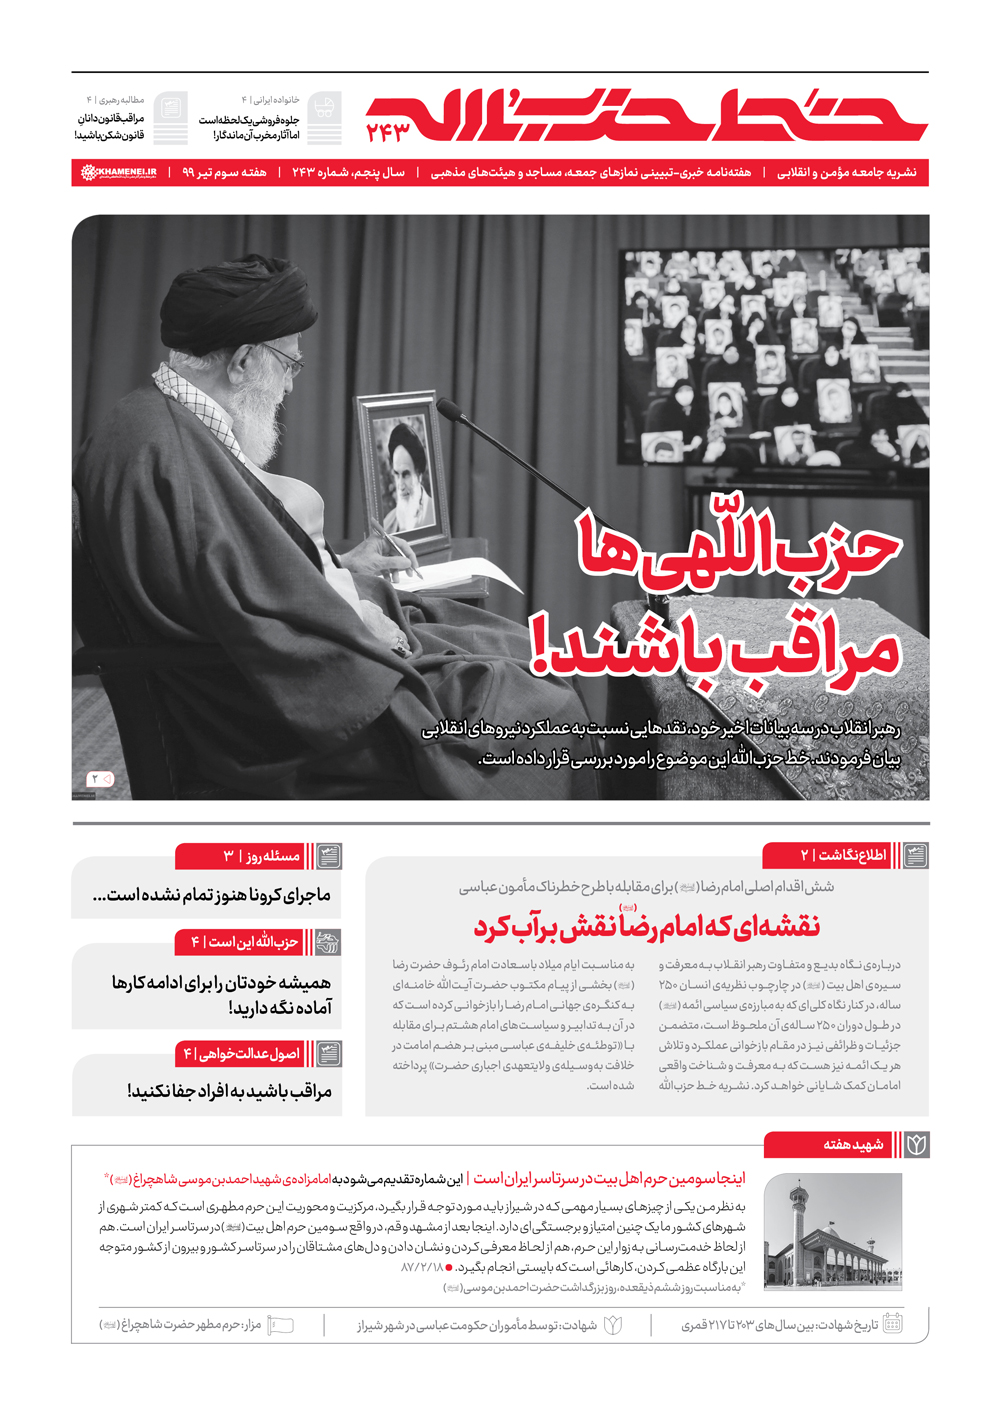 13990412000183 Test NewPhotoFree - خط حزبالله ۲۴۳ | حزباللهیها مراقب باشند!